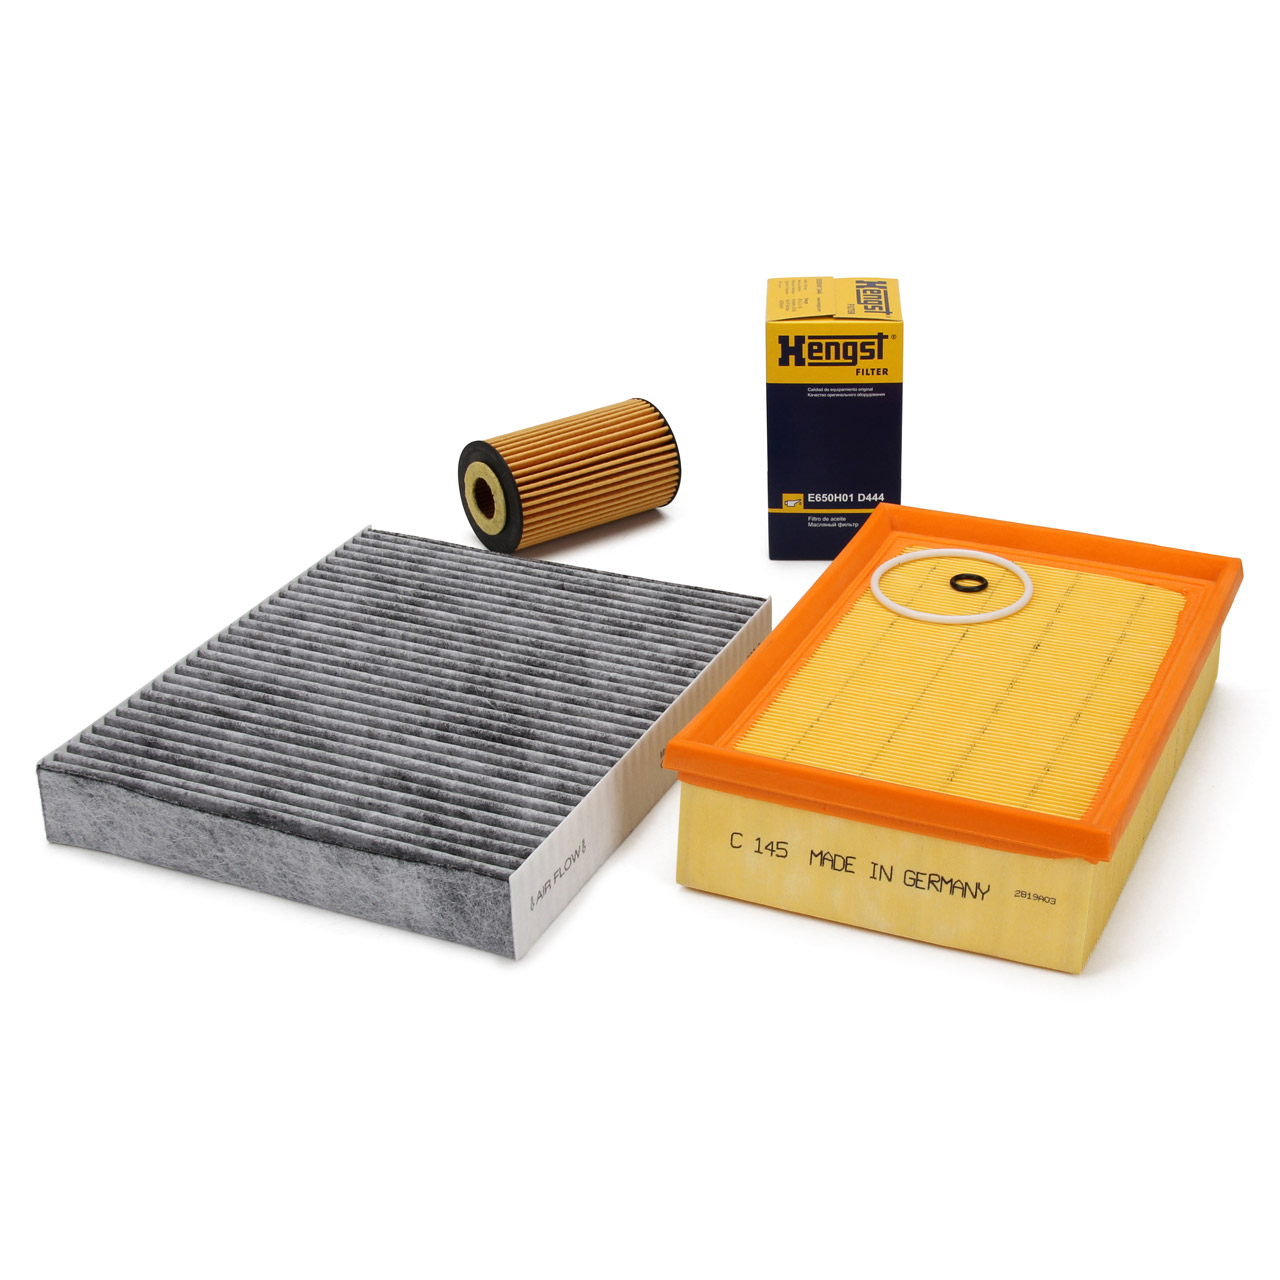 Inspektionskit Filterpaket für OPEL MOKKA / MOKKA X 1.6 CDTI / 4x4 110/136 PS